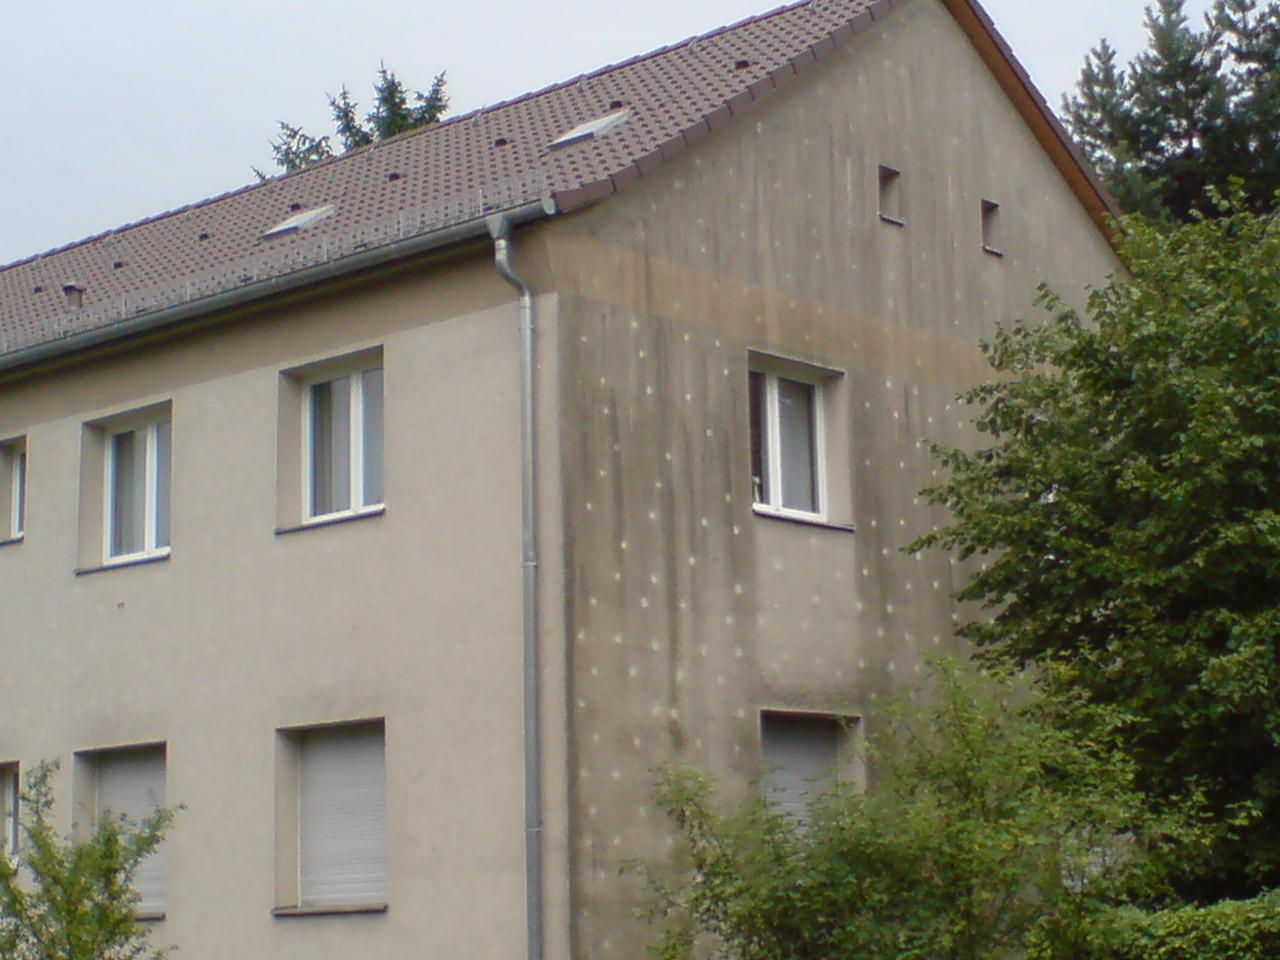 Bestandsgebäude mit gedämmter Fassade